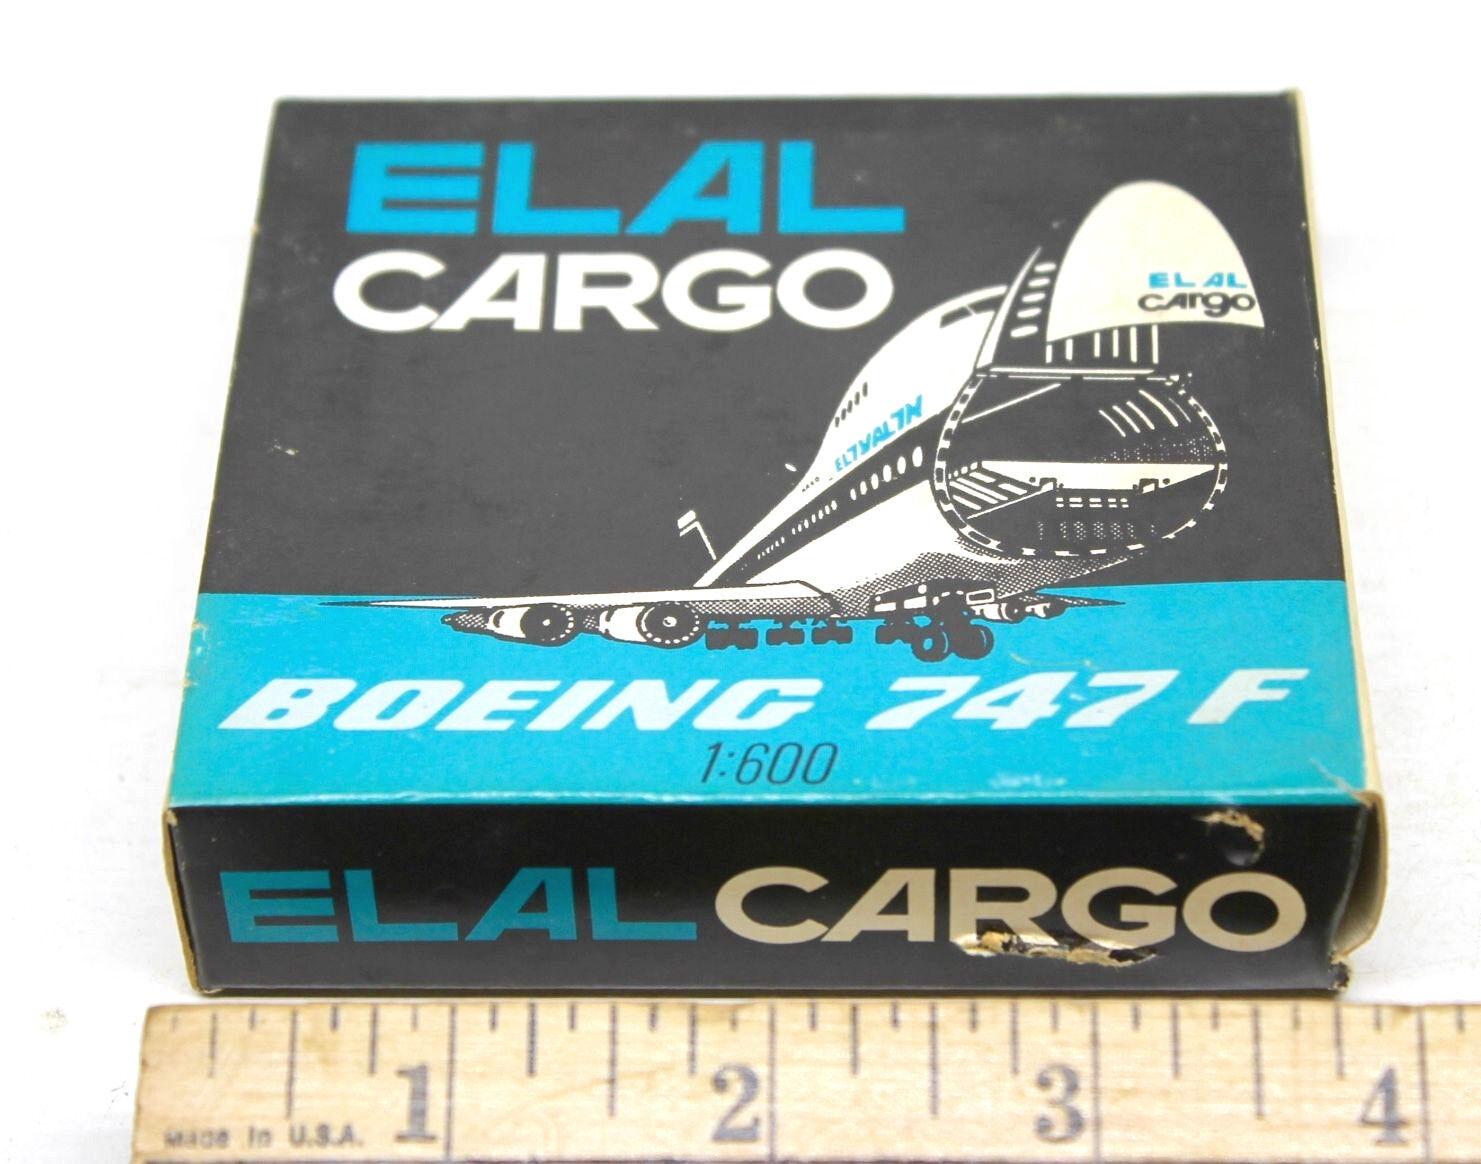 Vintage Schabak 1 600 Boeing 747F Elal Elal Elal Cargo Jet Die Cast réplica Modelo  901 22 a4e519